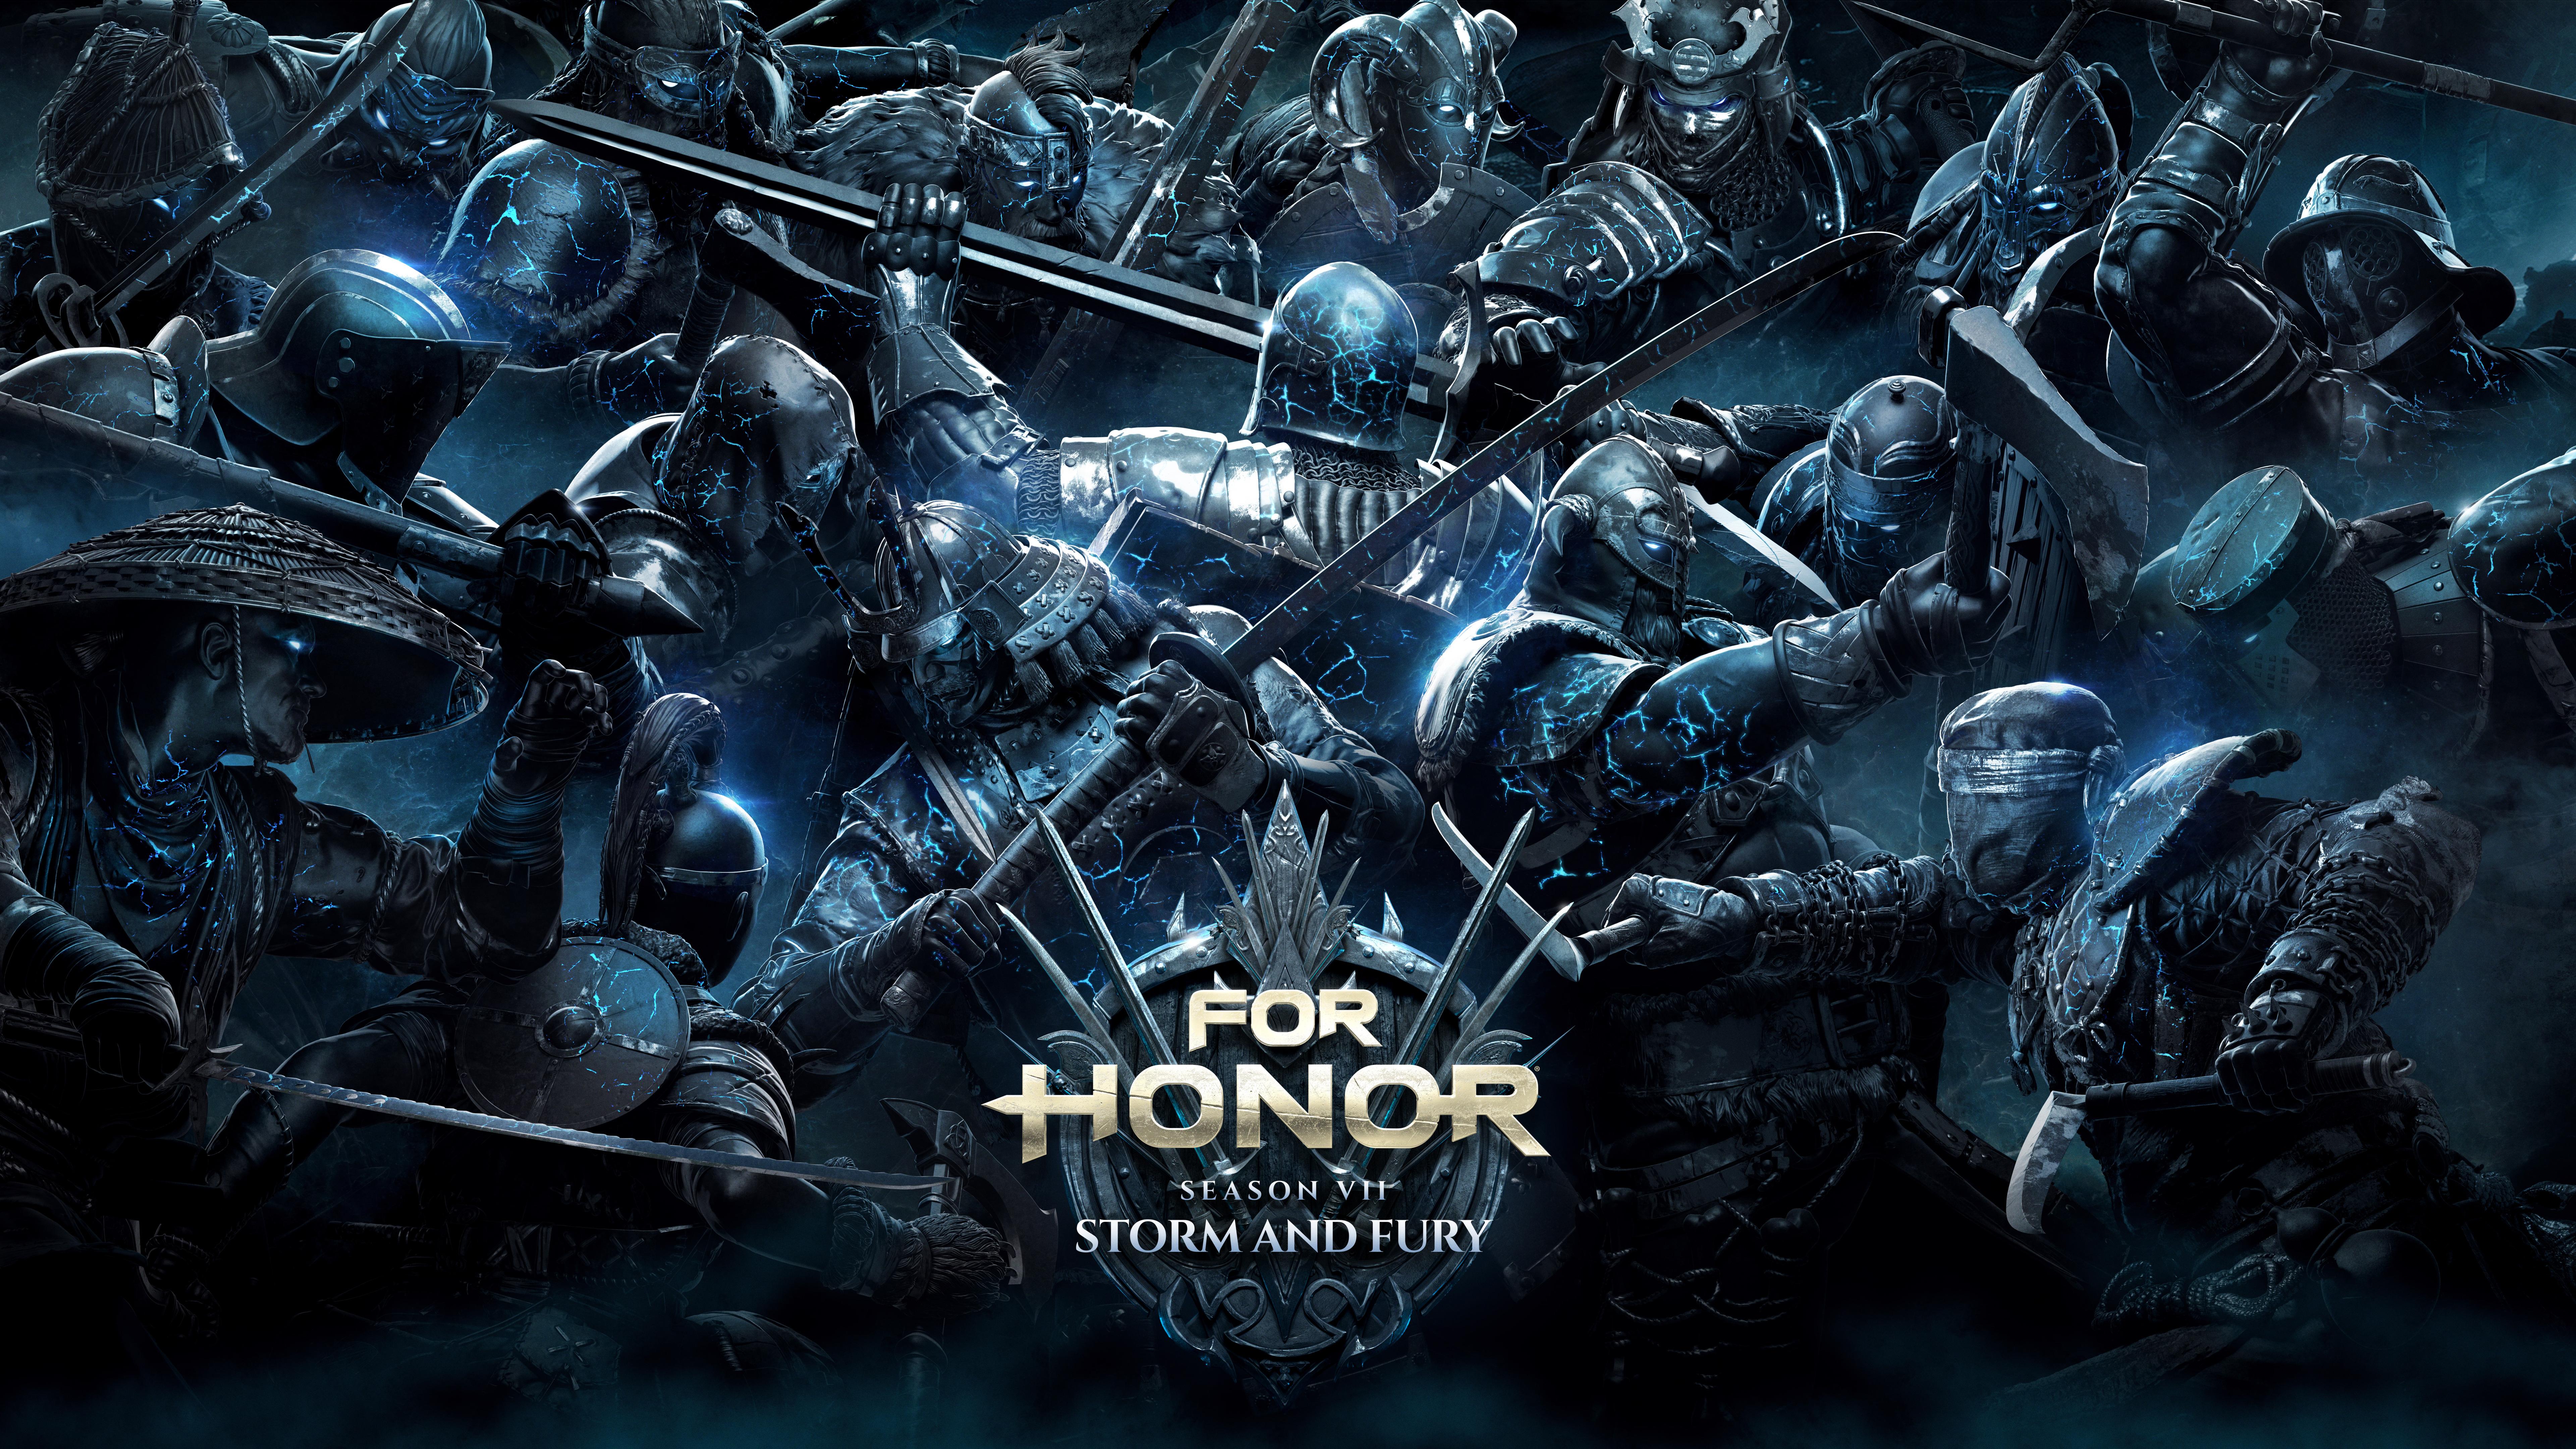 7680x4320 For Honor Season 7 Storm And Fury 2018 8k 8k Hd 4k